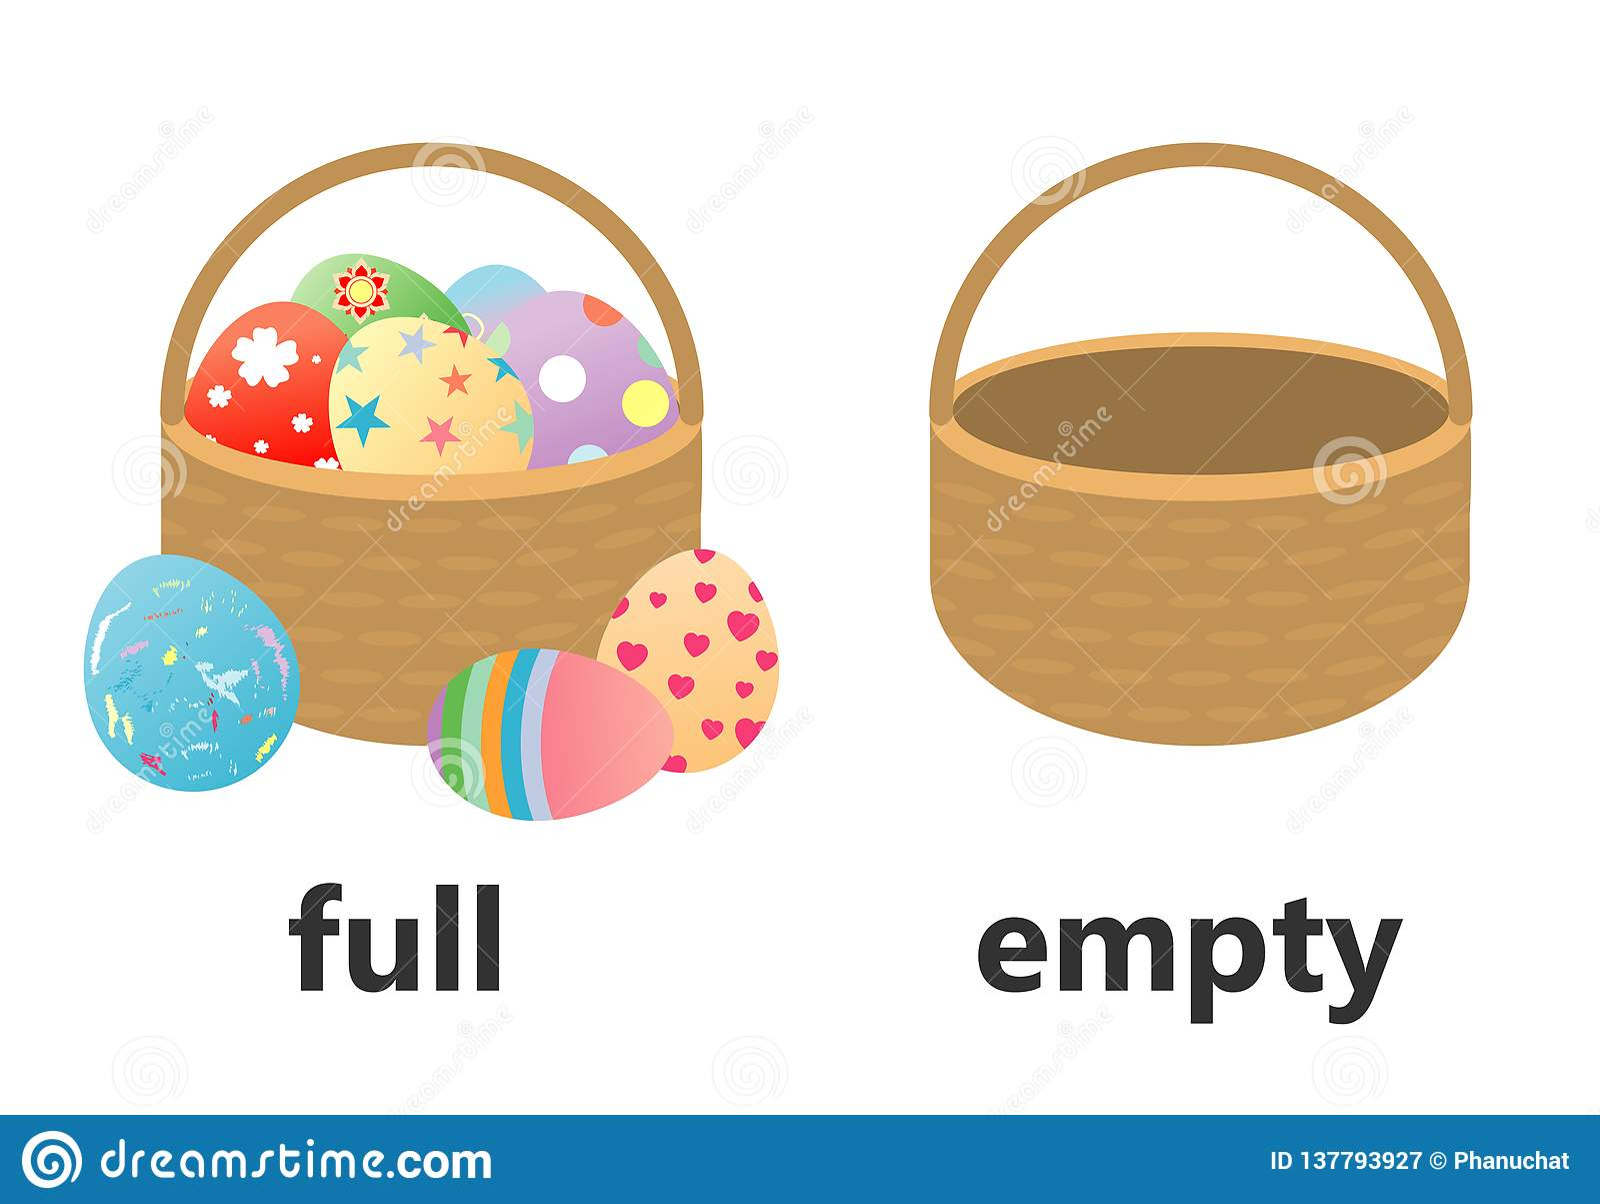 Opposite Words Full And Empty Cartoon Vector